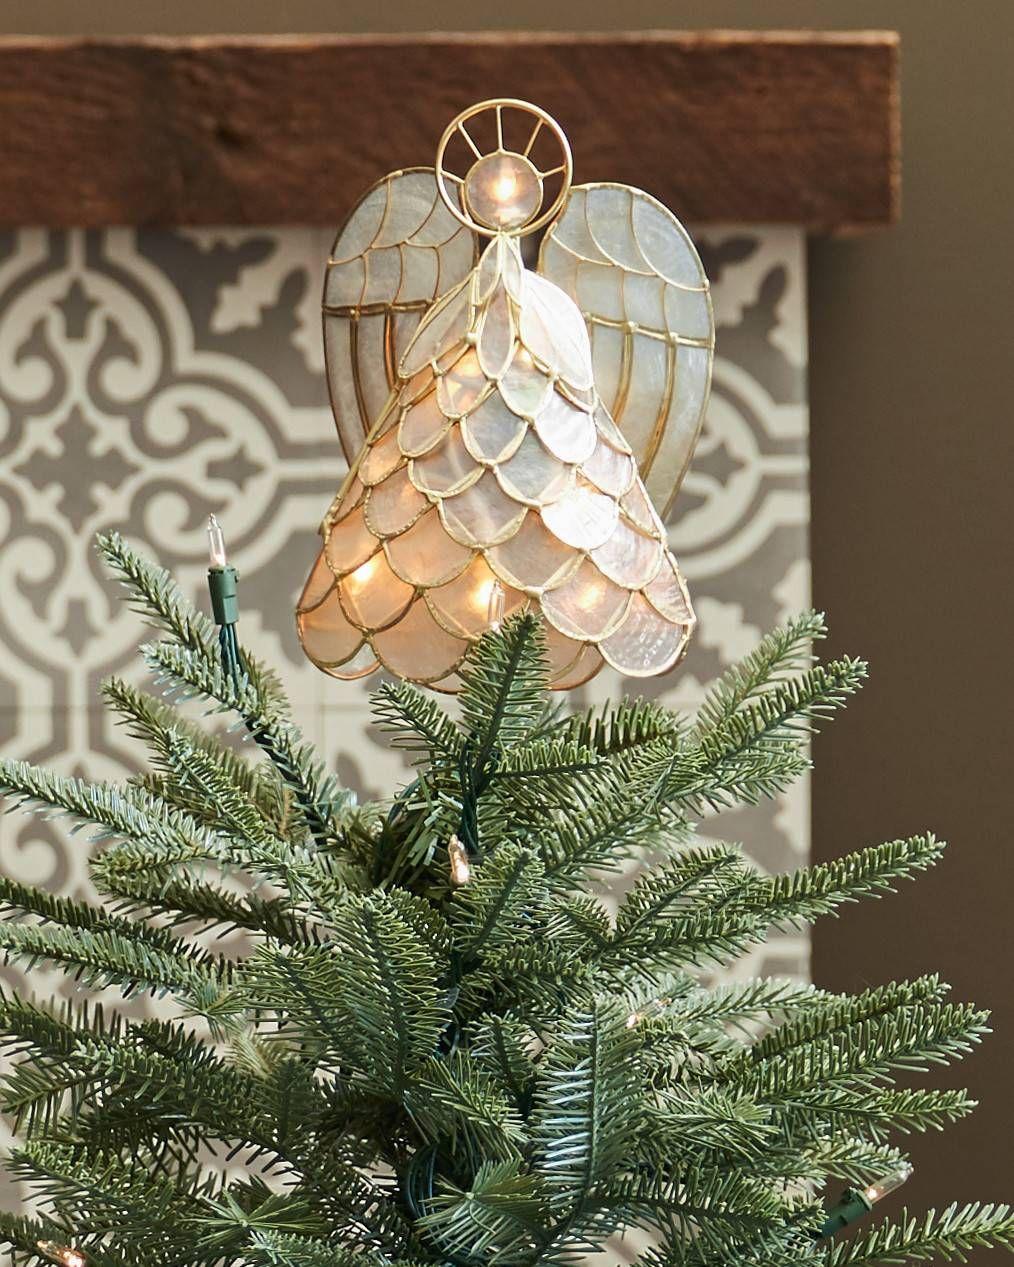 Small Angel Christmas Tree Topper: Capiz Angel Lighted Tree Topper